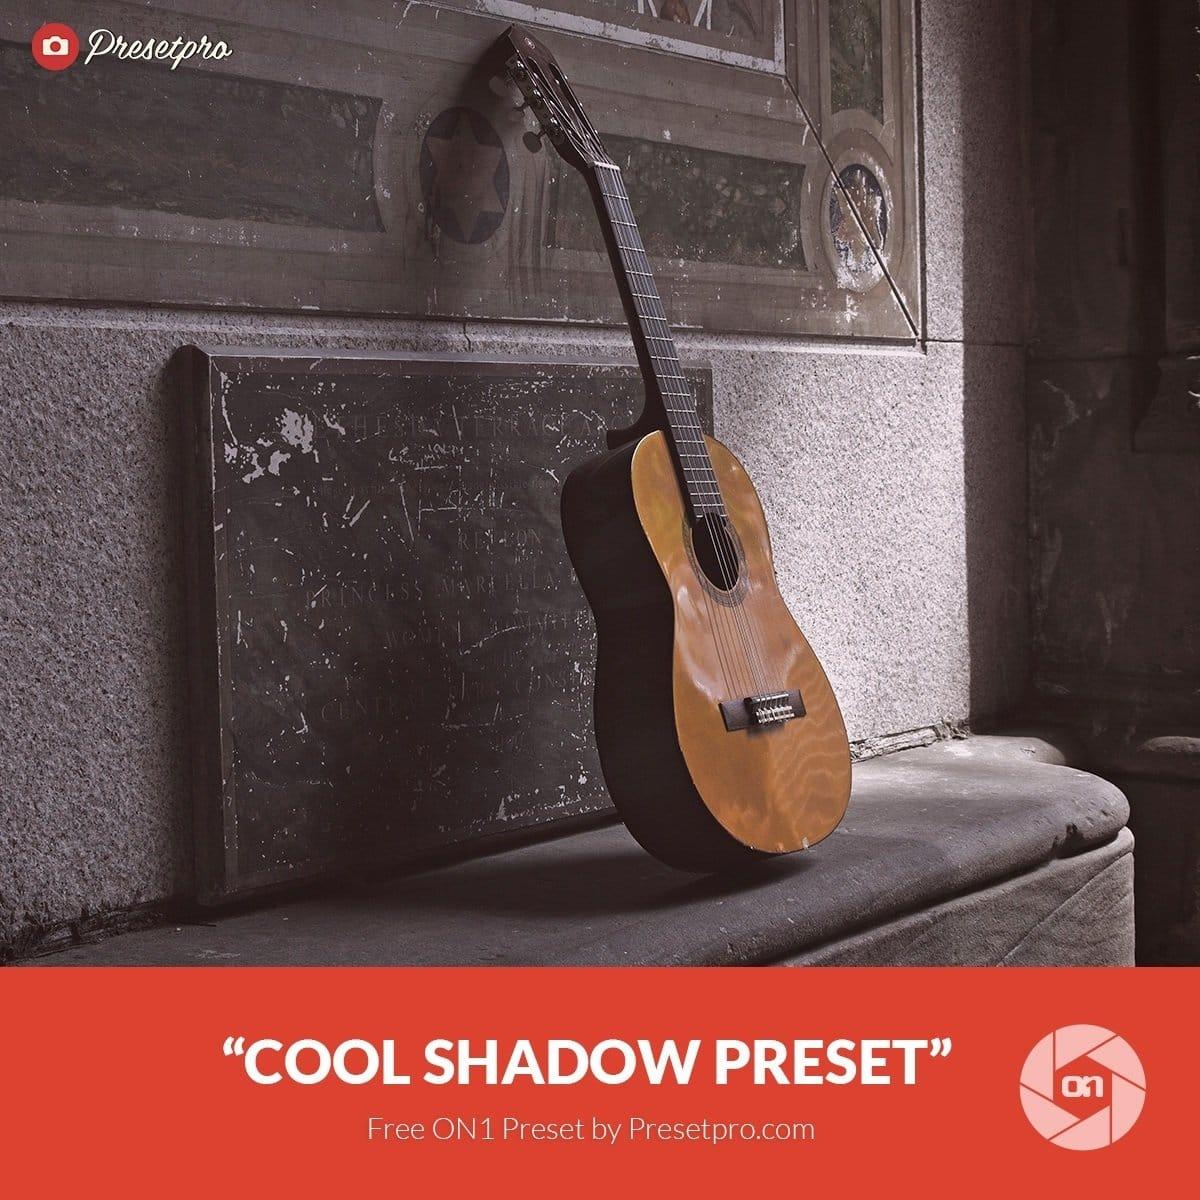 Free-On1-Preset-Cool-Shadows-Presetpro.com